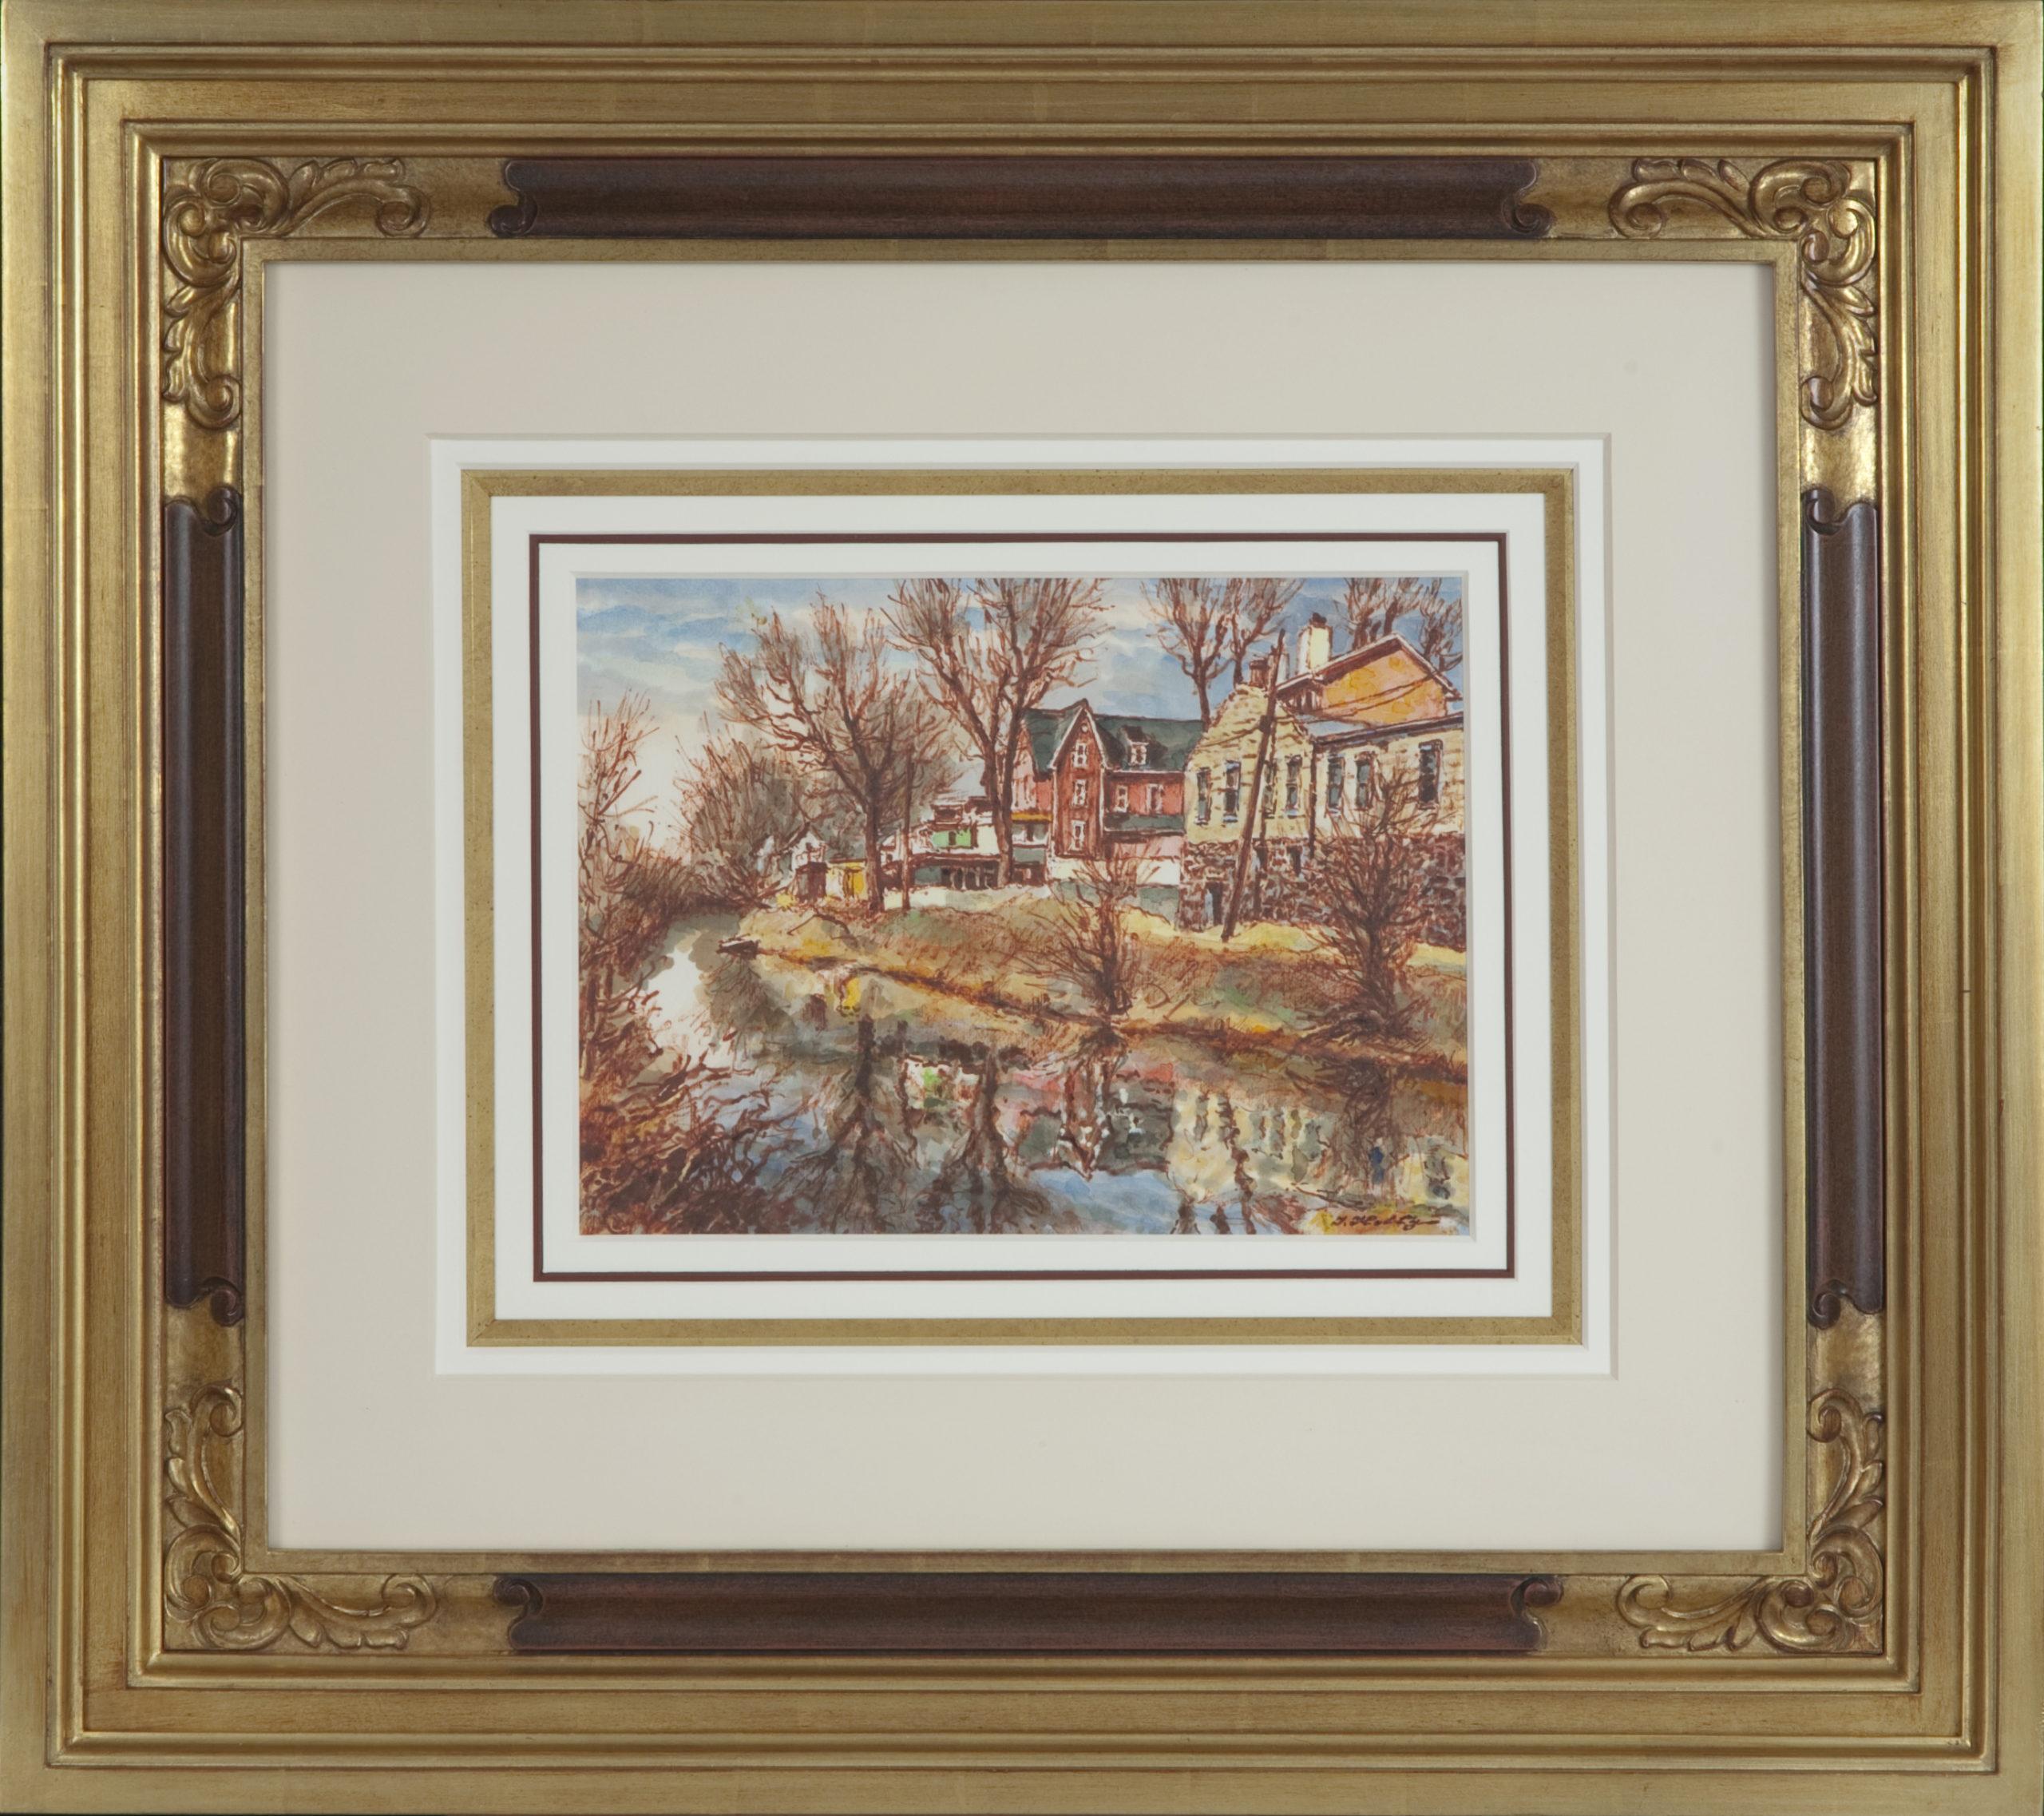 091 Canal Lambertville NJ 1982 - Watercolor - 12.5 x 9.5 - Frame: 27.25 x 24 x 2.5